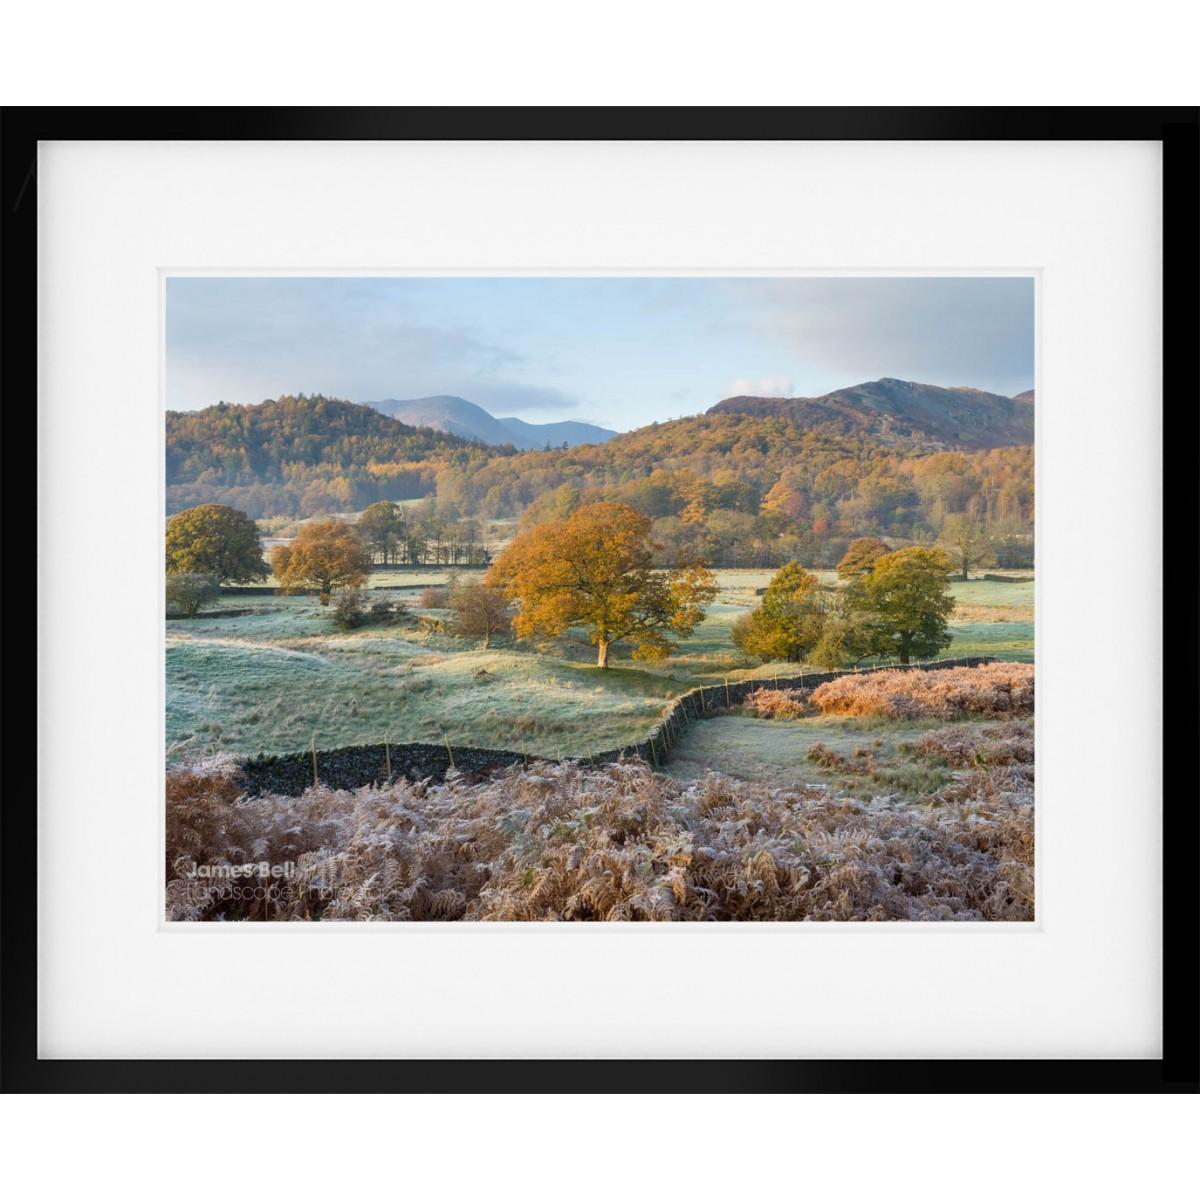 Elterwater Common View framed print